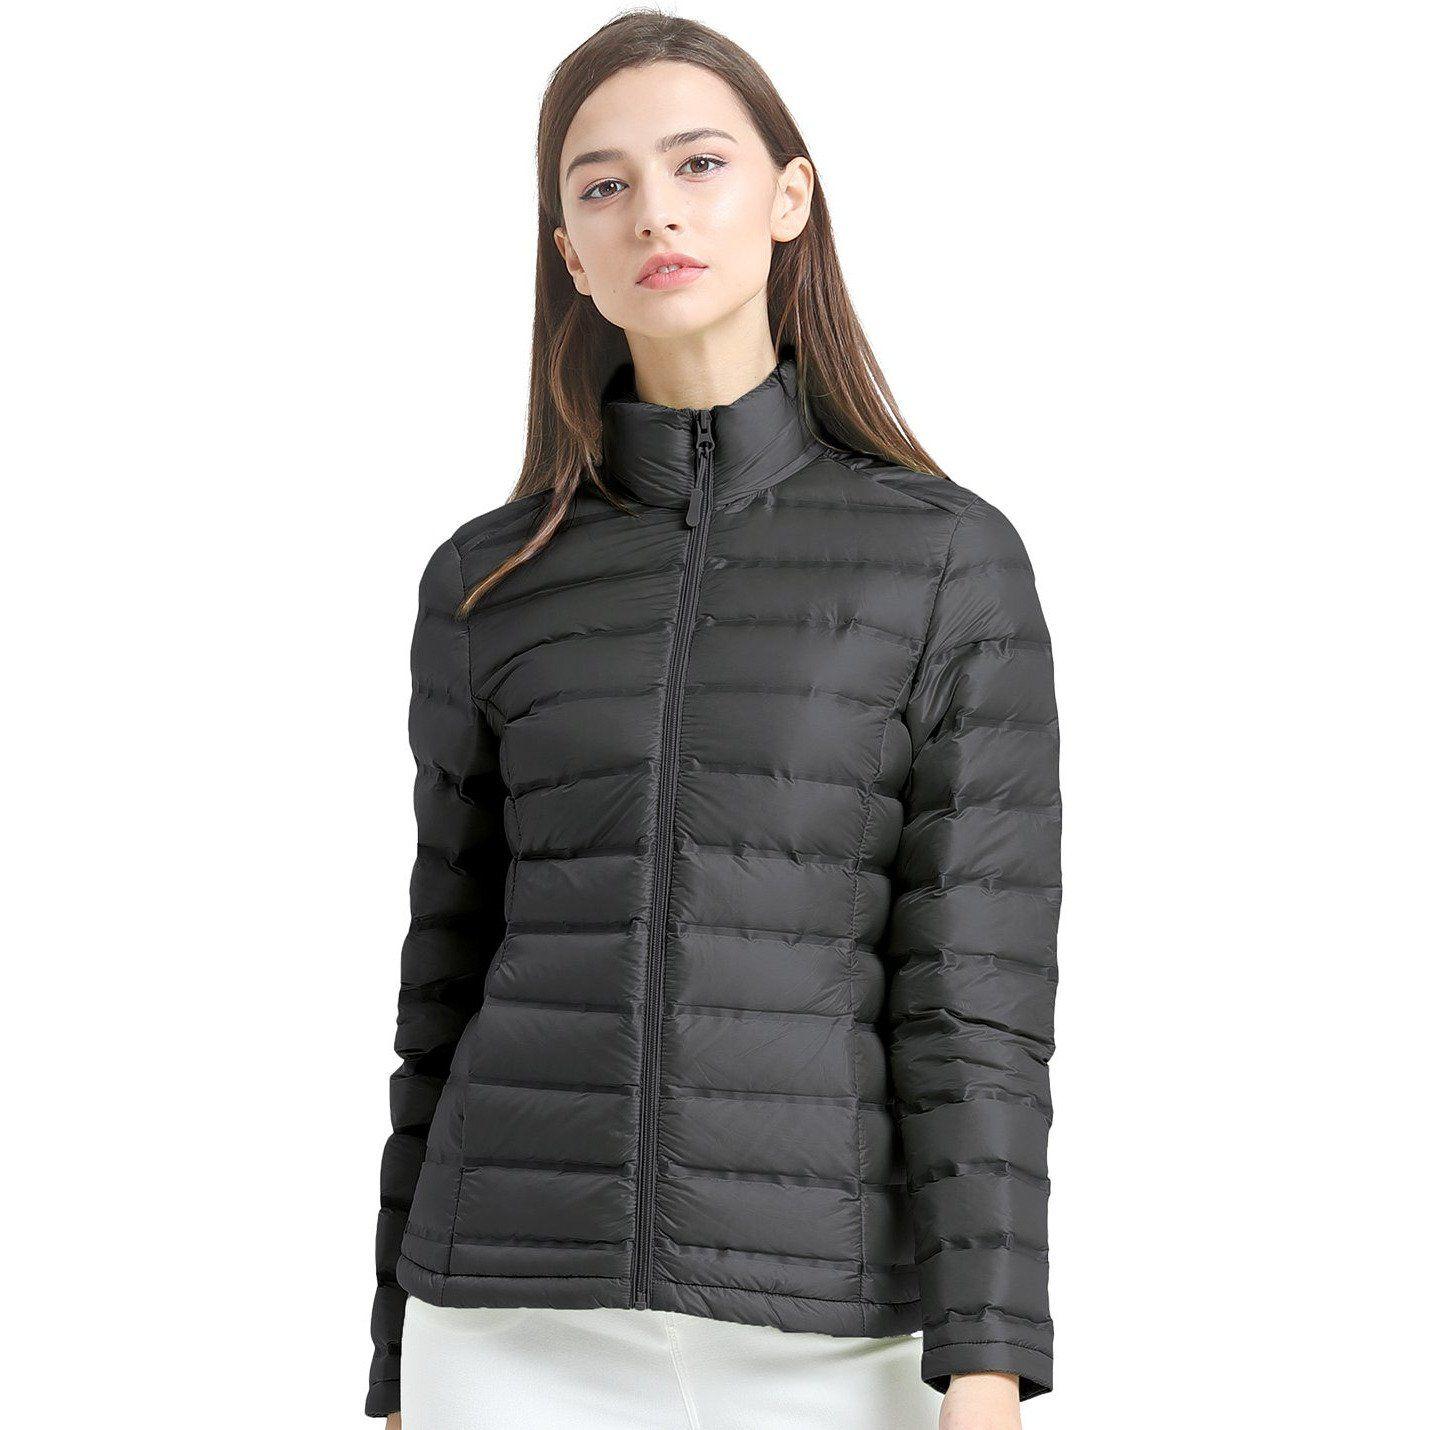 Large Purple Essentials Womens Lightweight Water-Resistant Packable Hooded Down Jacket